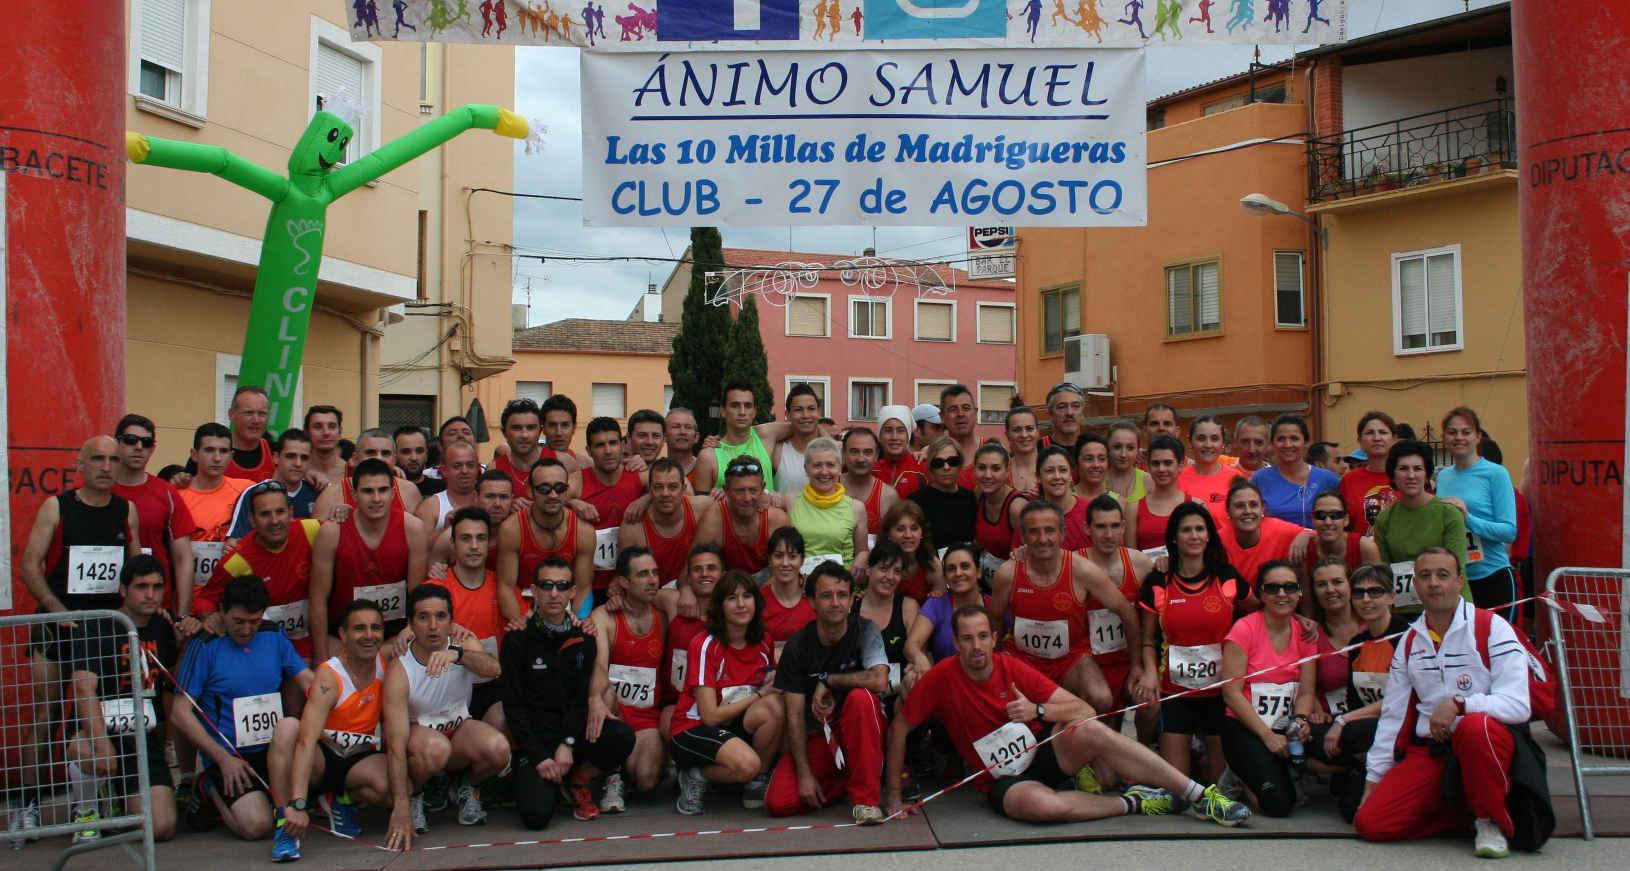 Club de Atletismo 27 de agosto Madrigueras (Foto: Paco Villaescusa)